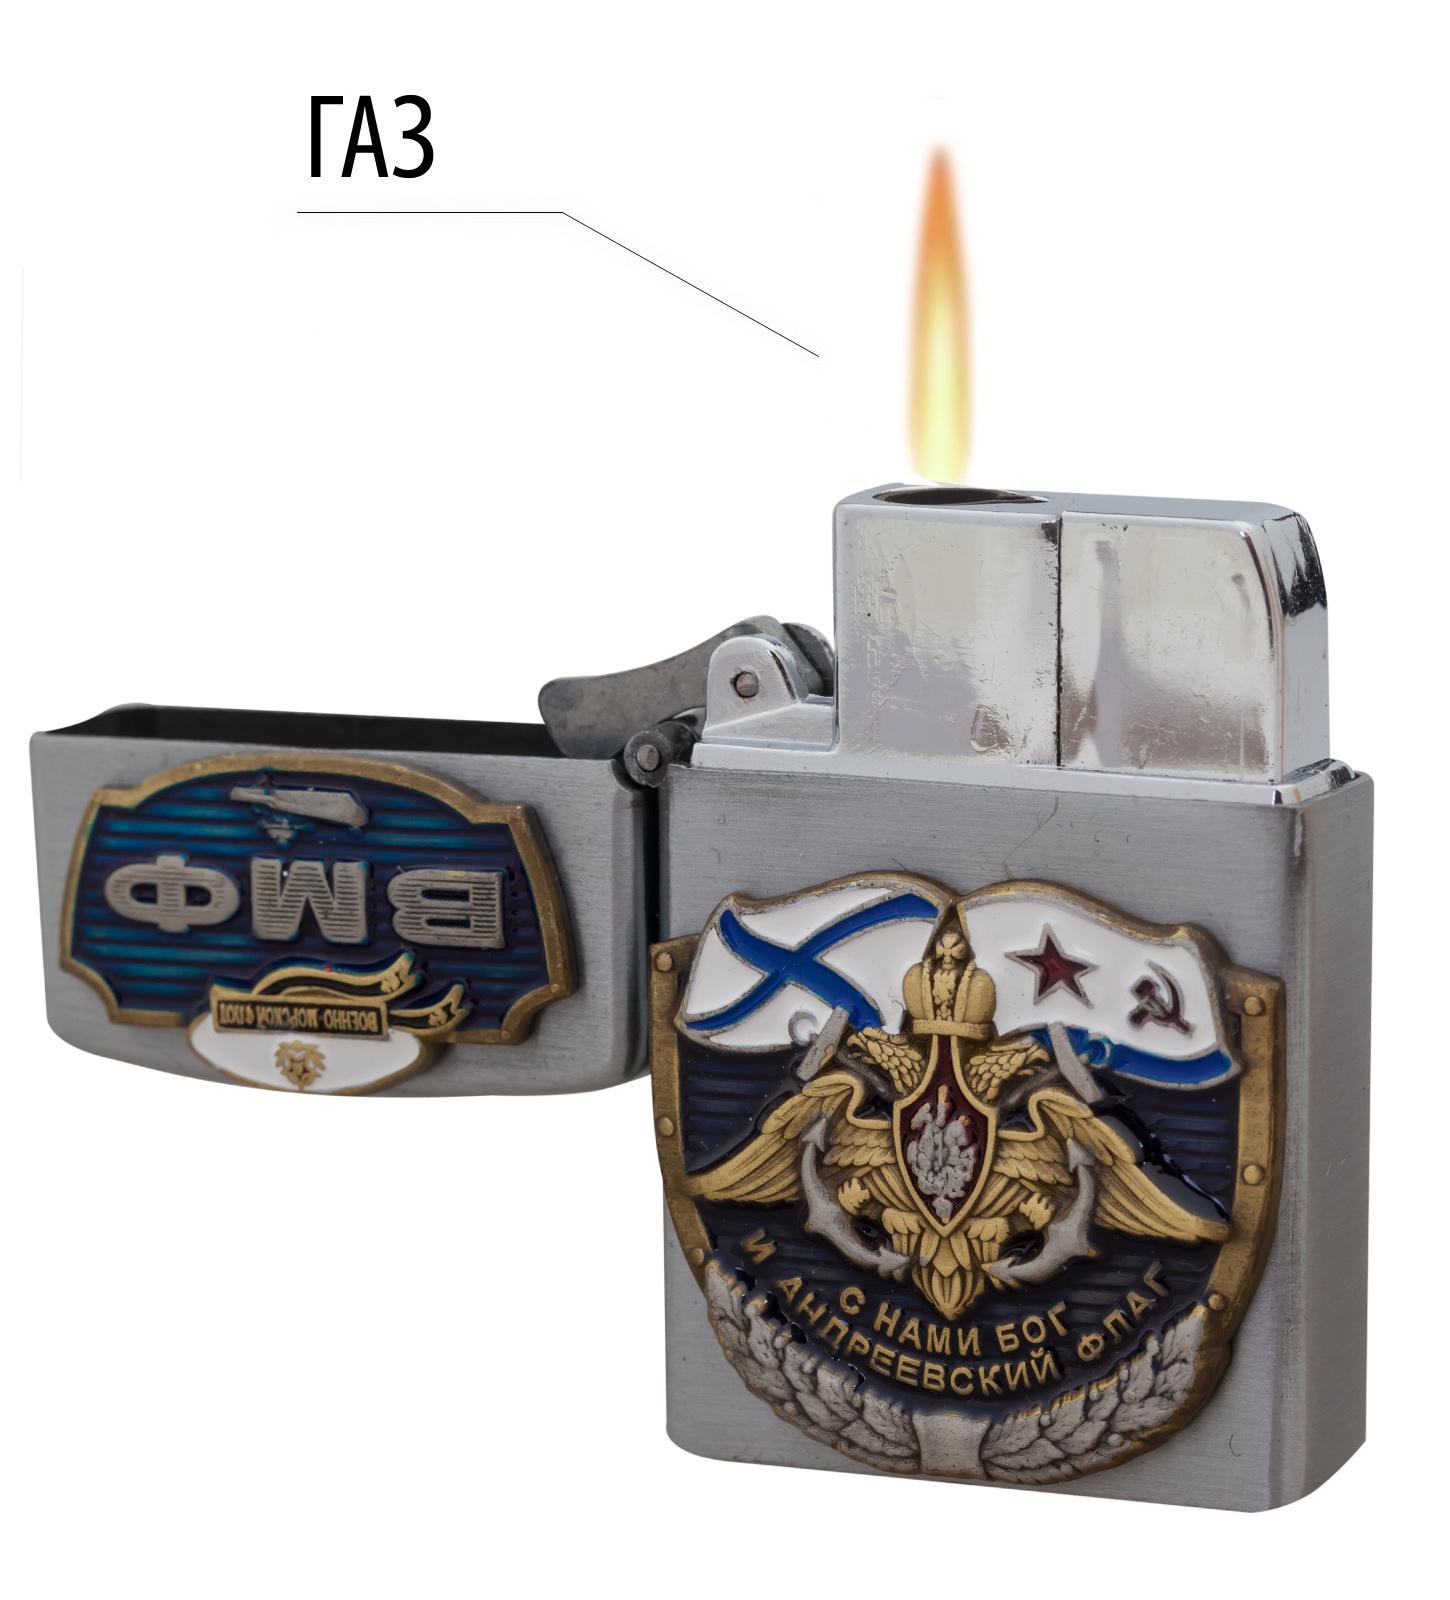 "Статусная газовая зажигалка ""За ВМФ!"""